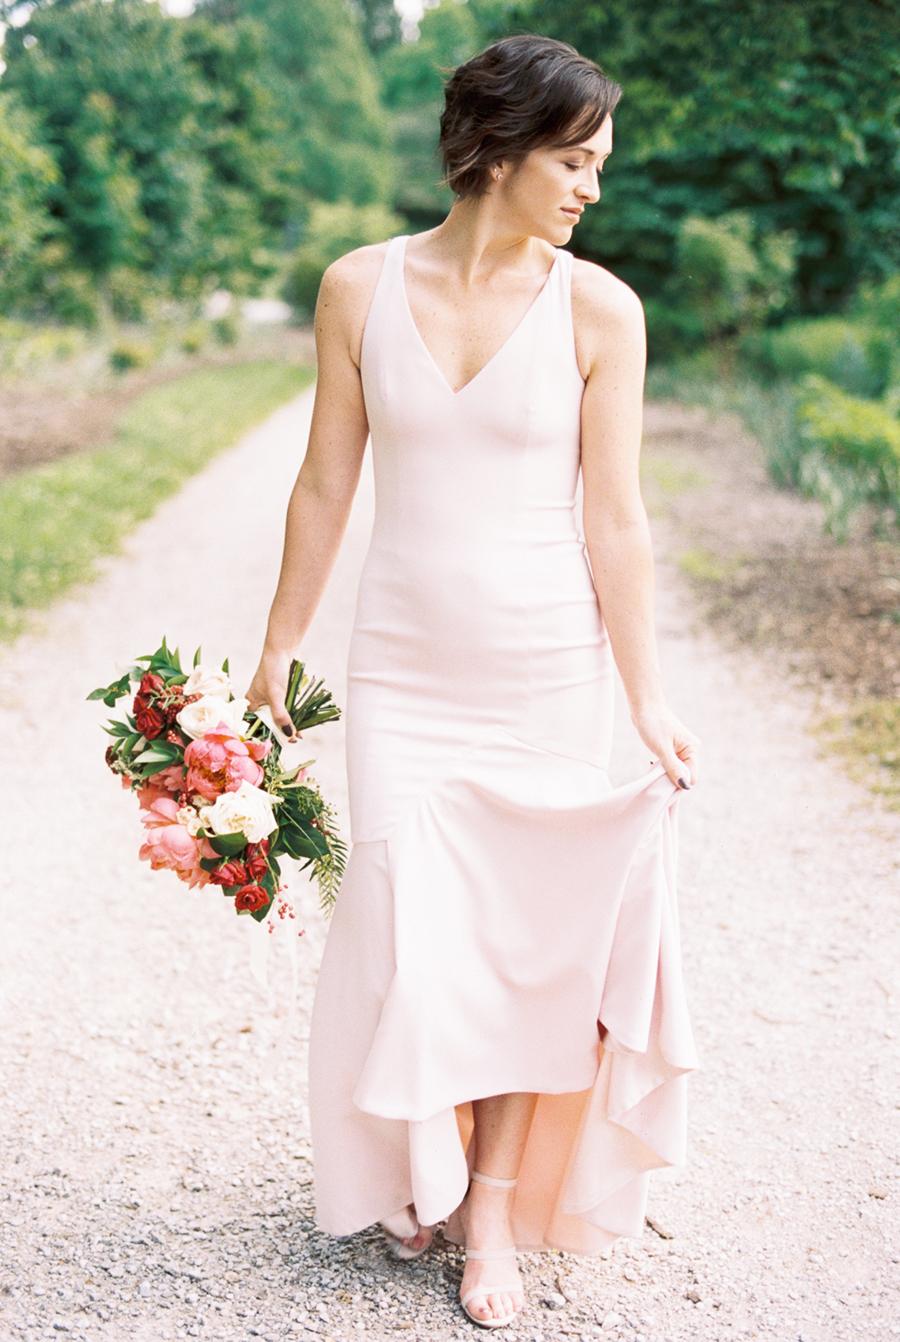 Film_Wedding_Editoral_Cincinnati_Columbus_Photographer12.jpg